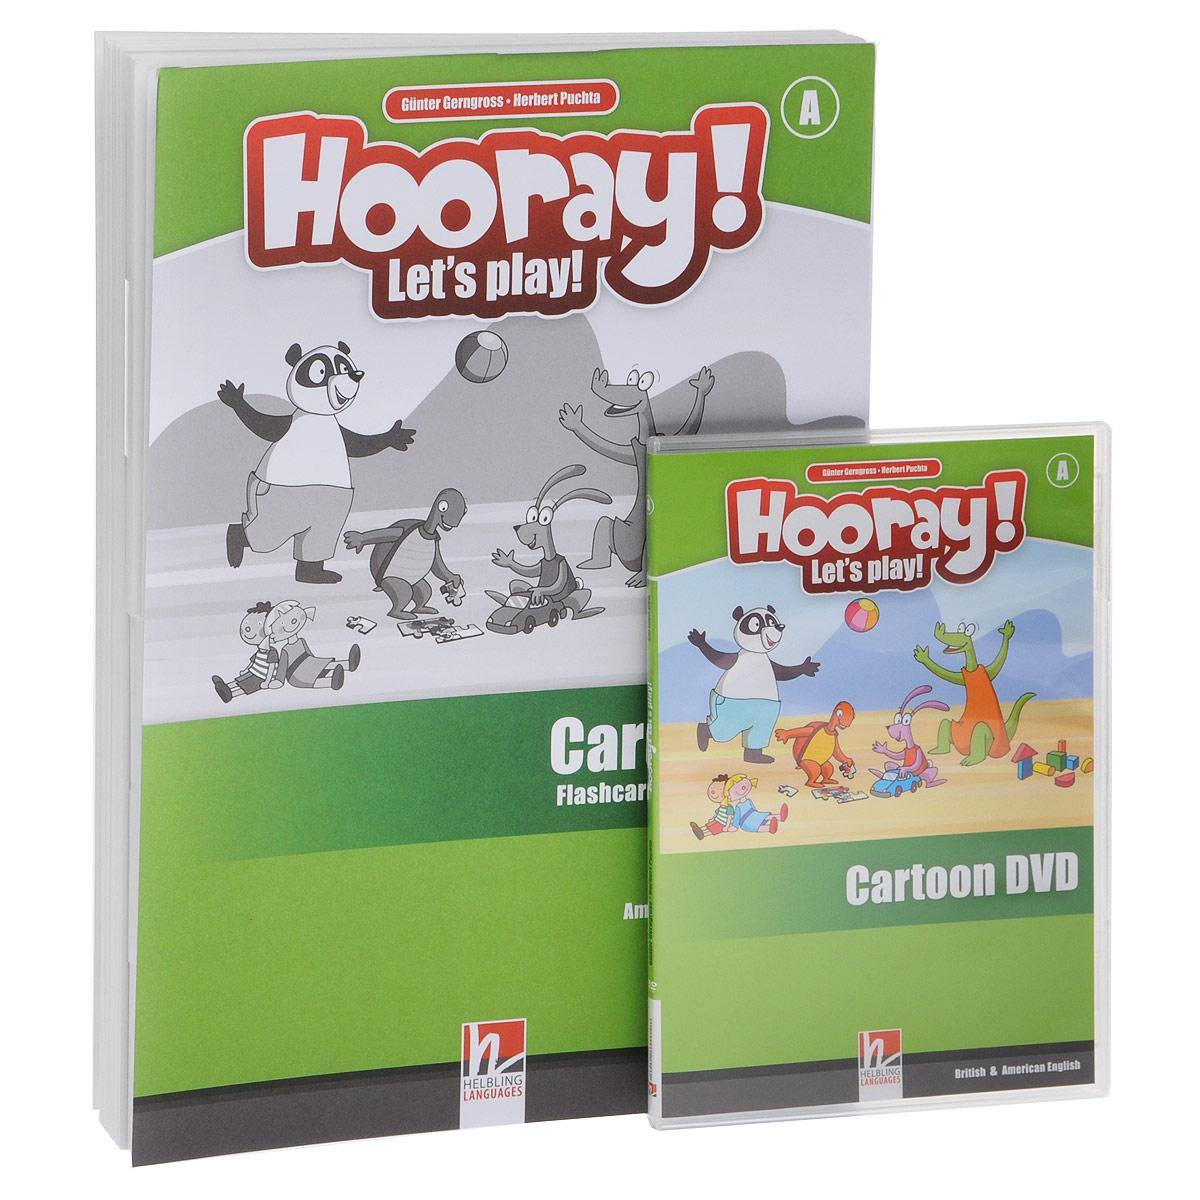 Hooray! Let's Play! A Visual Pack: Level A (набор из 116 карточек + DVD-ROM и игрушка)